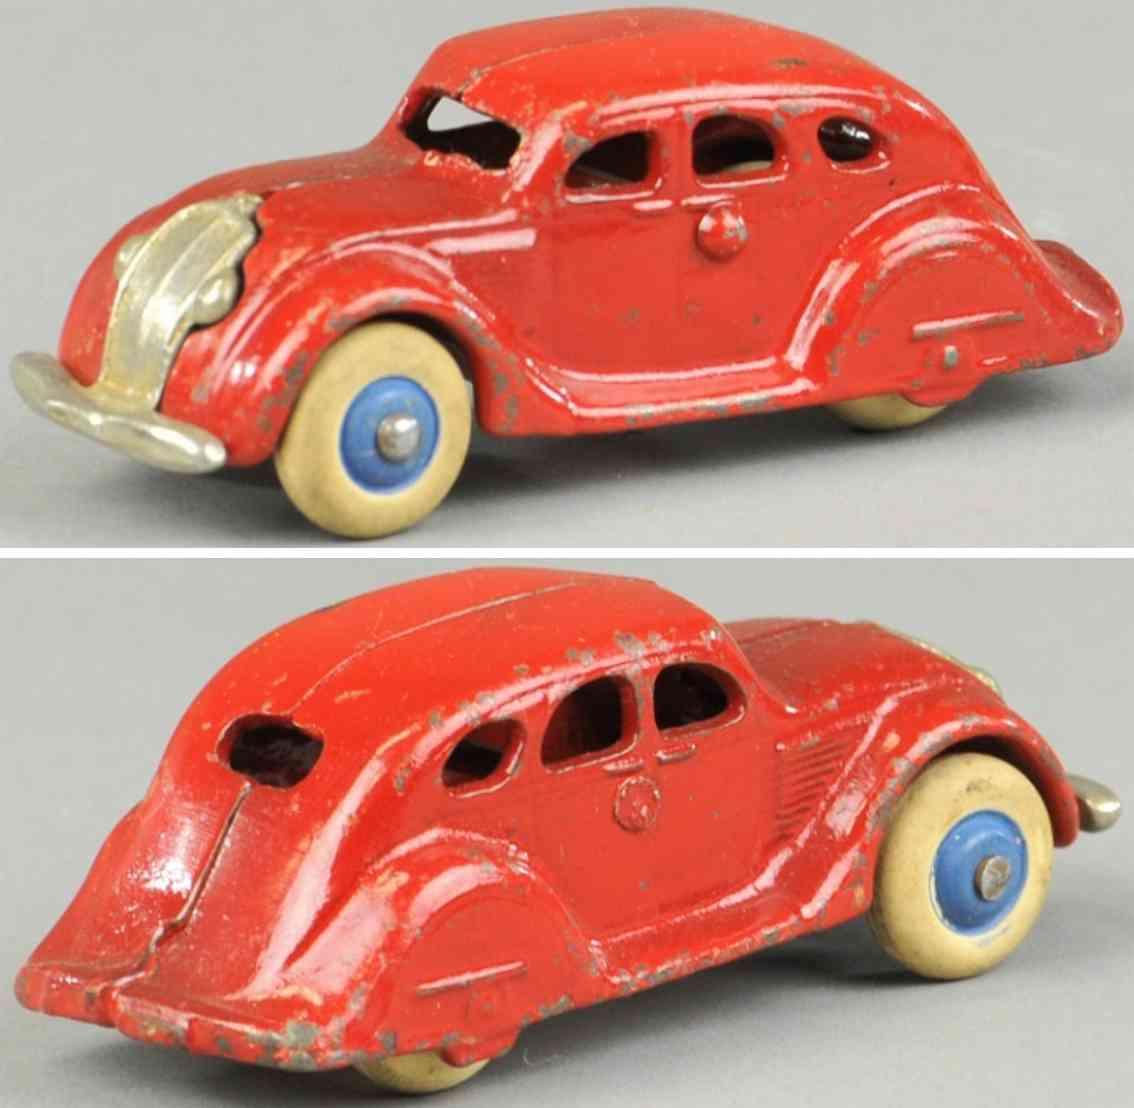 hubley cast iron toy car airflow sedan red